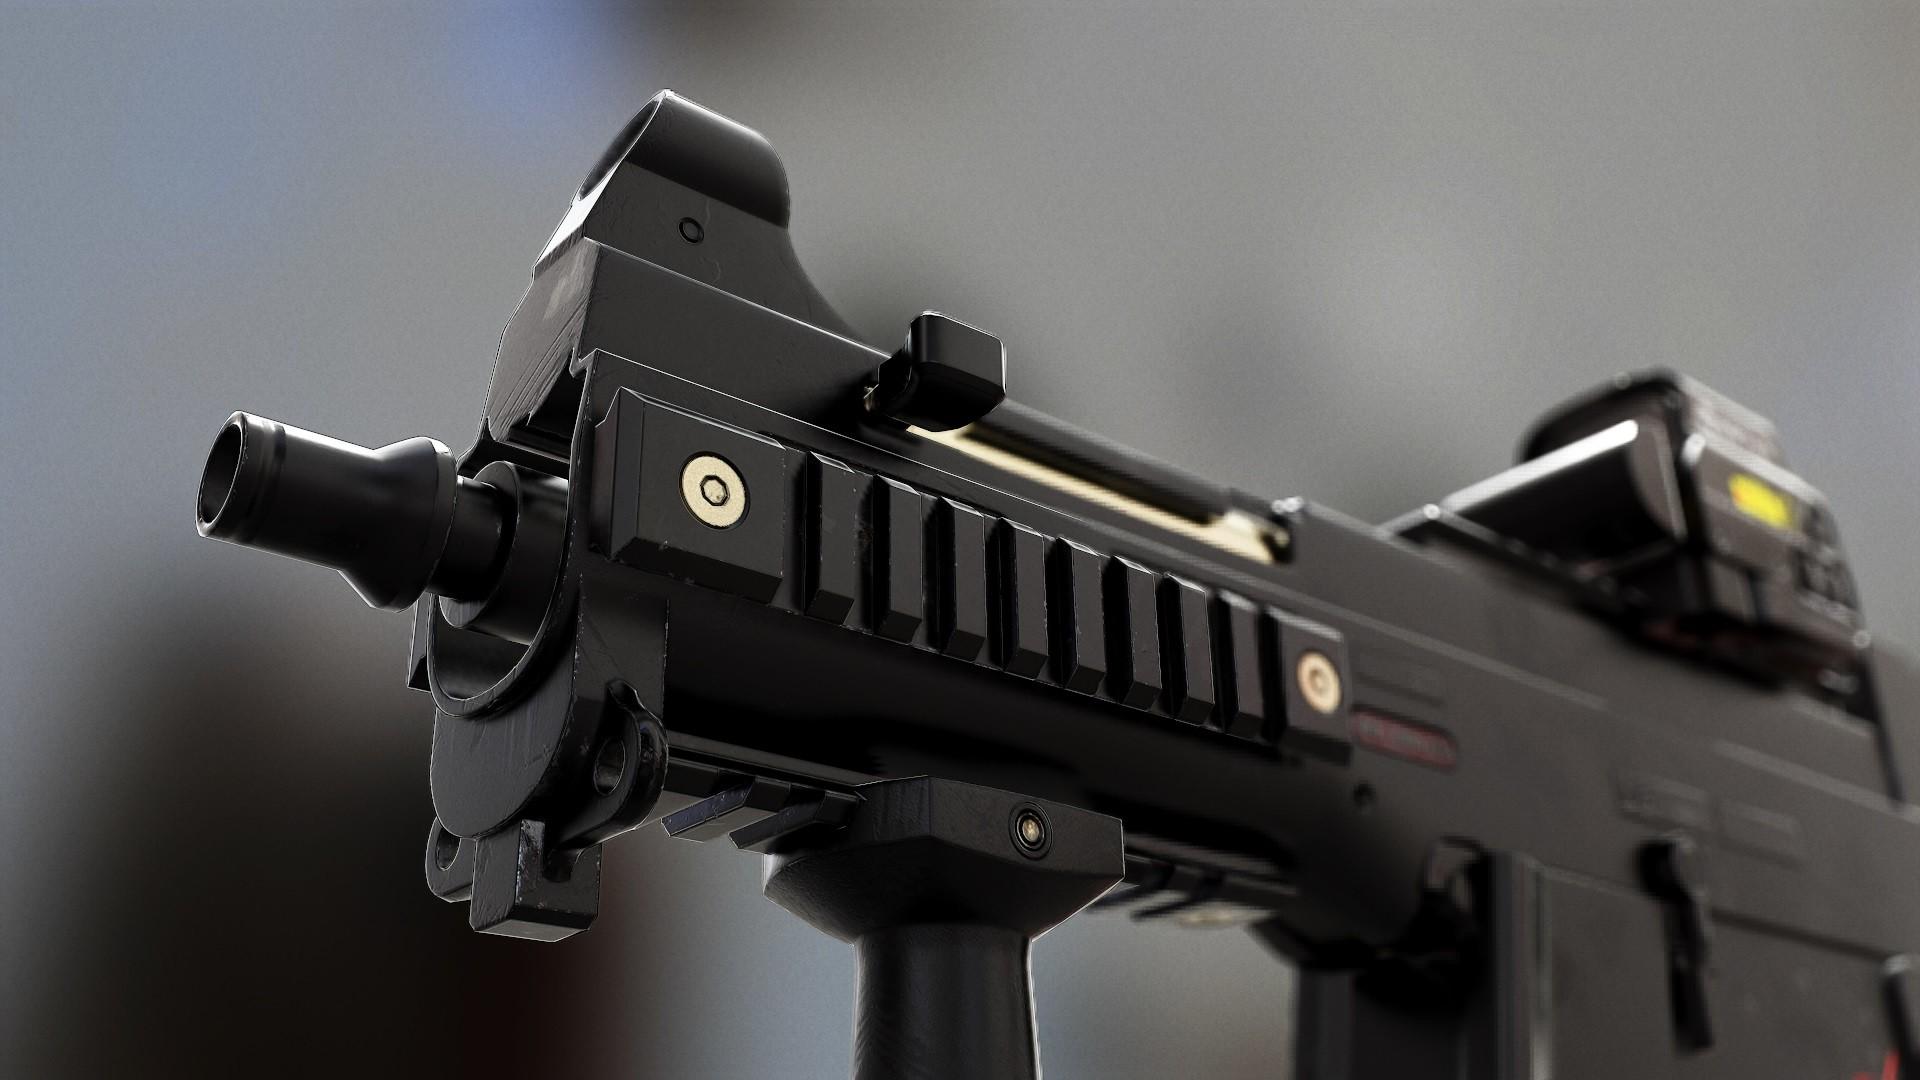 Pubg Wallpaper Guns Dr Disrespect And Shroud Pubg Weapon Skins Leaked